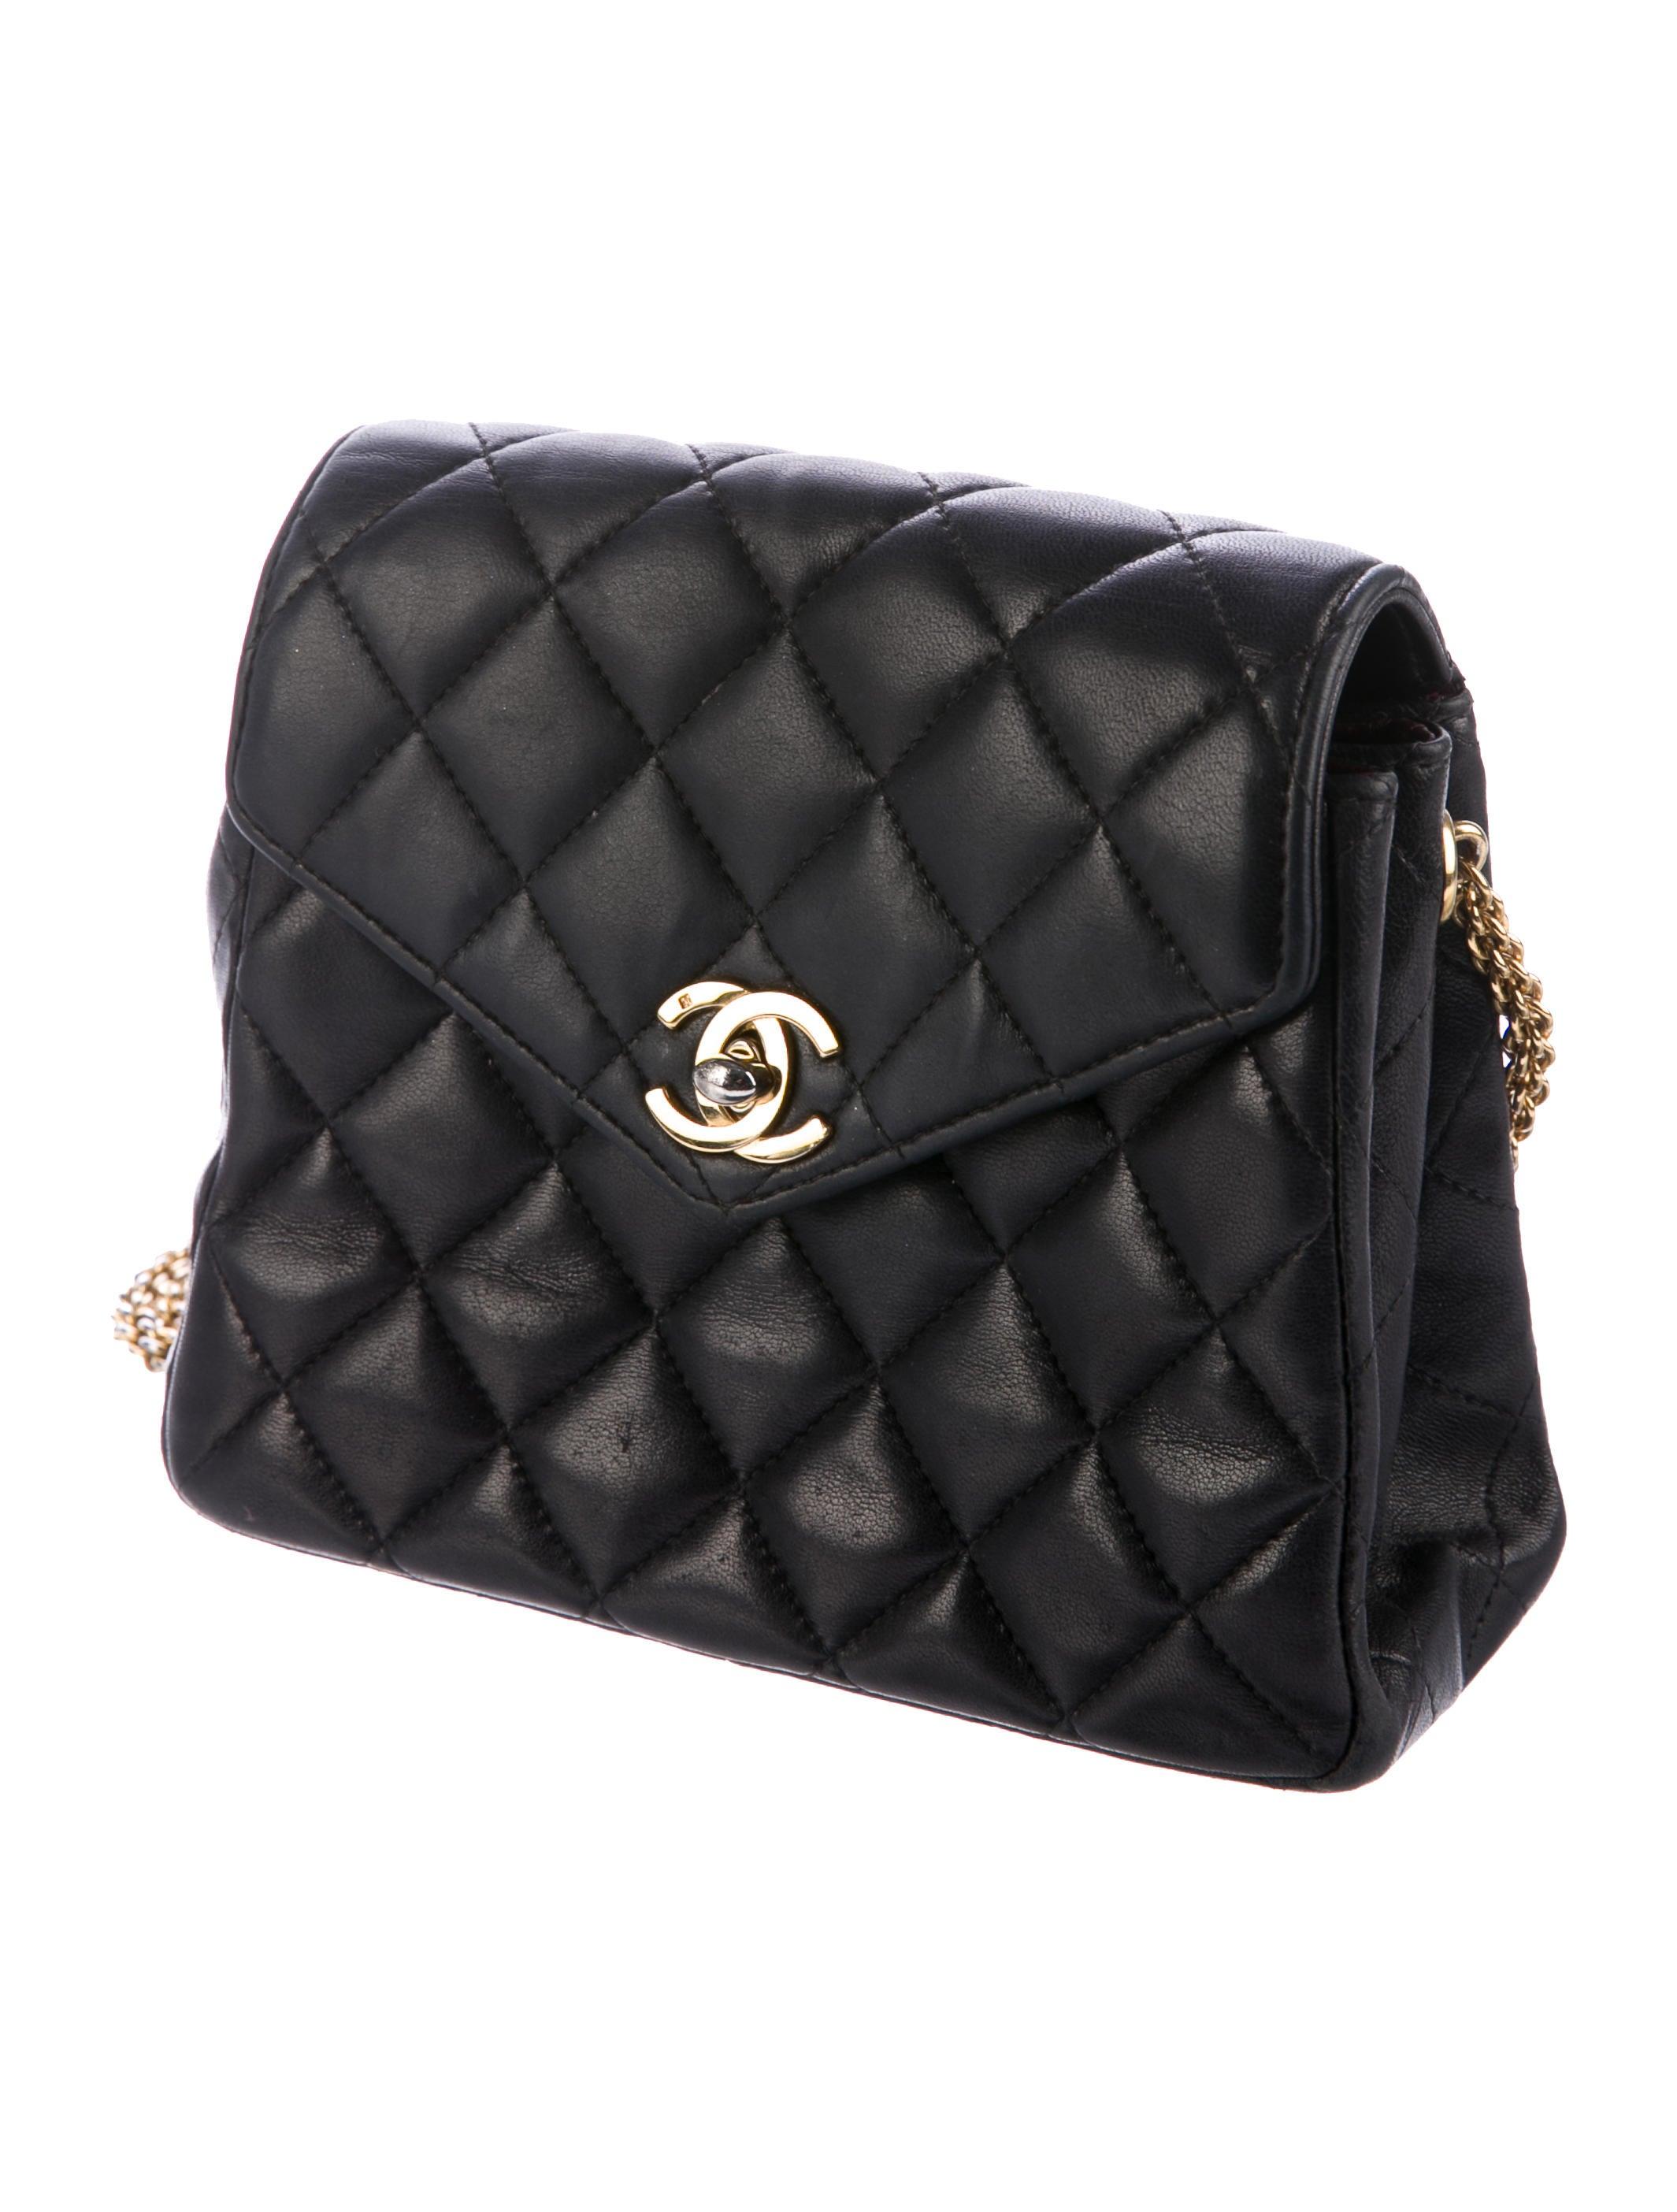 Bijoux Vintage Chanel : Chanel vintage quilted bijoux flap bag handbags